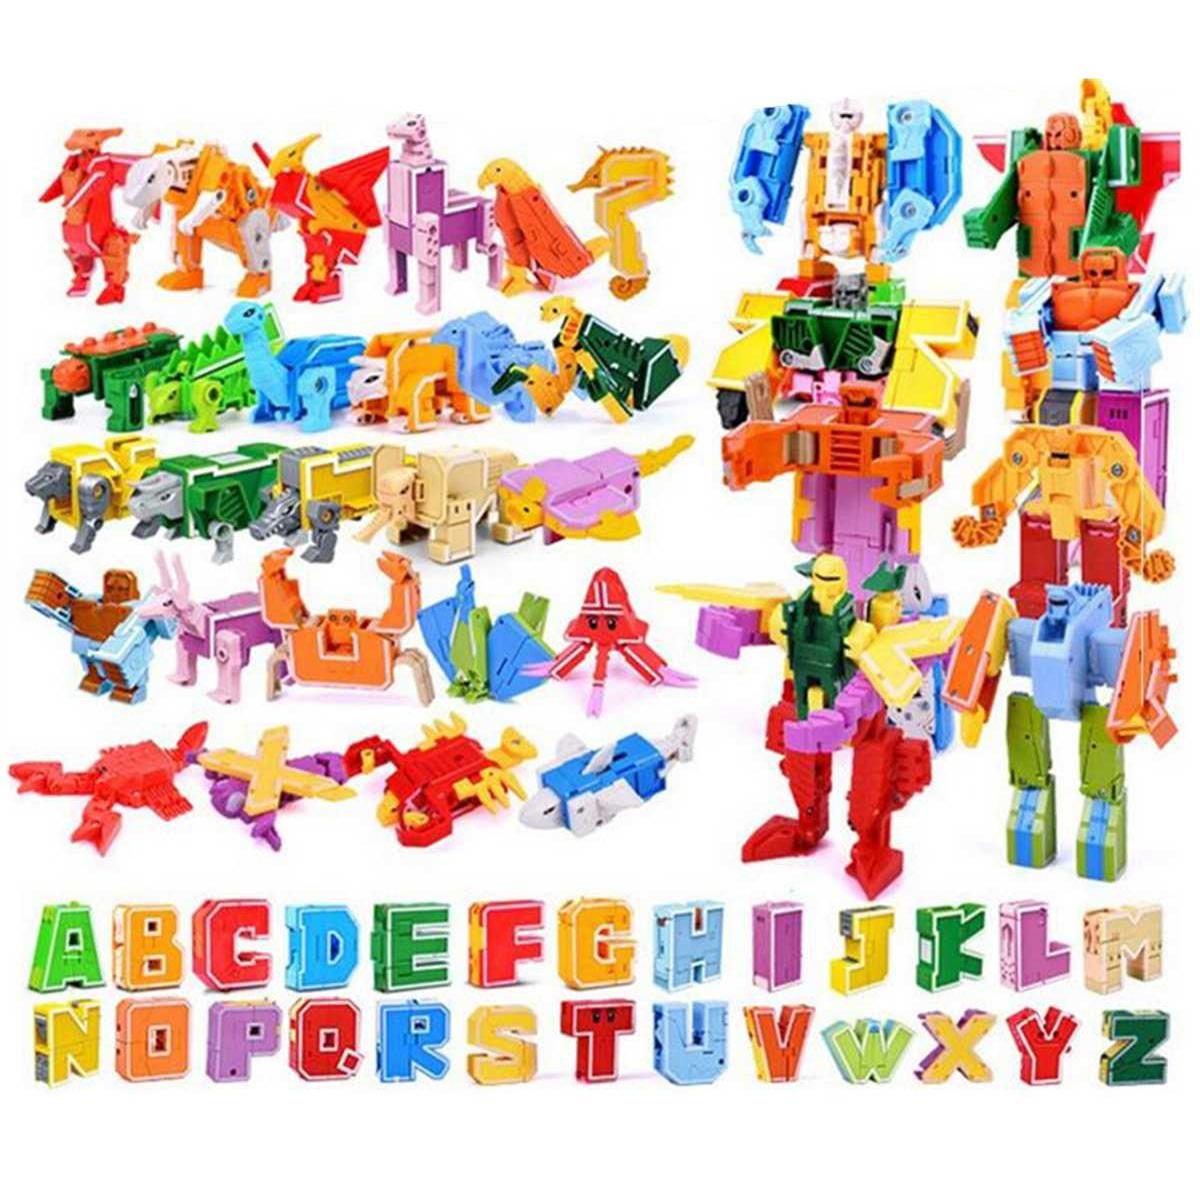 Трансботы Lingvo Zoo 1 Toy (алфавит английский 26 букв от A до Z)